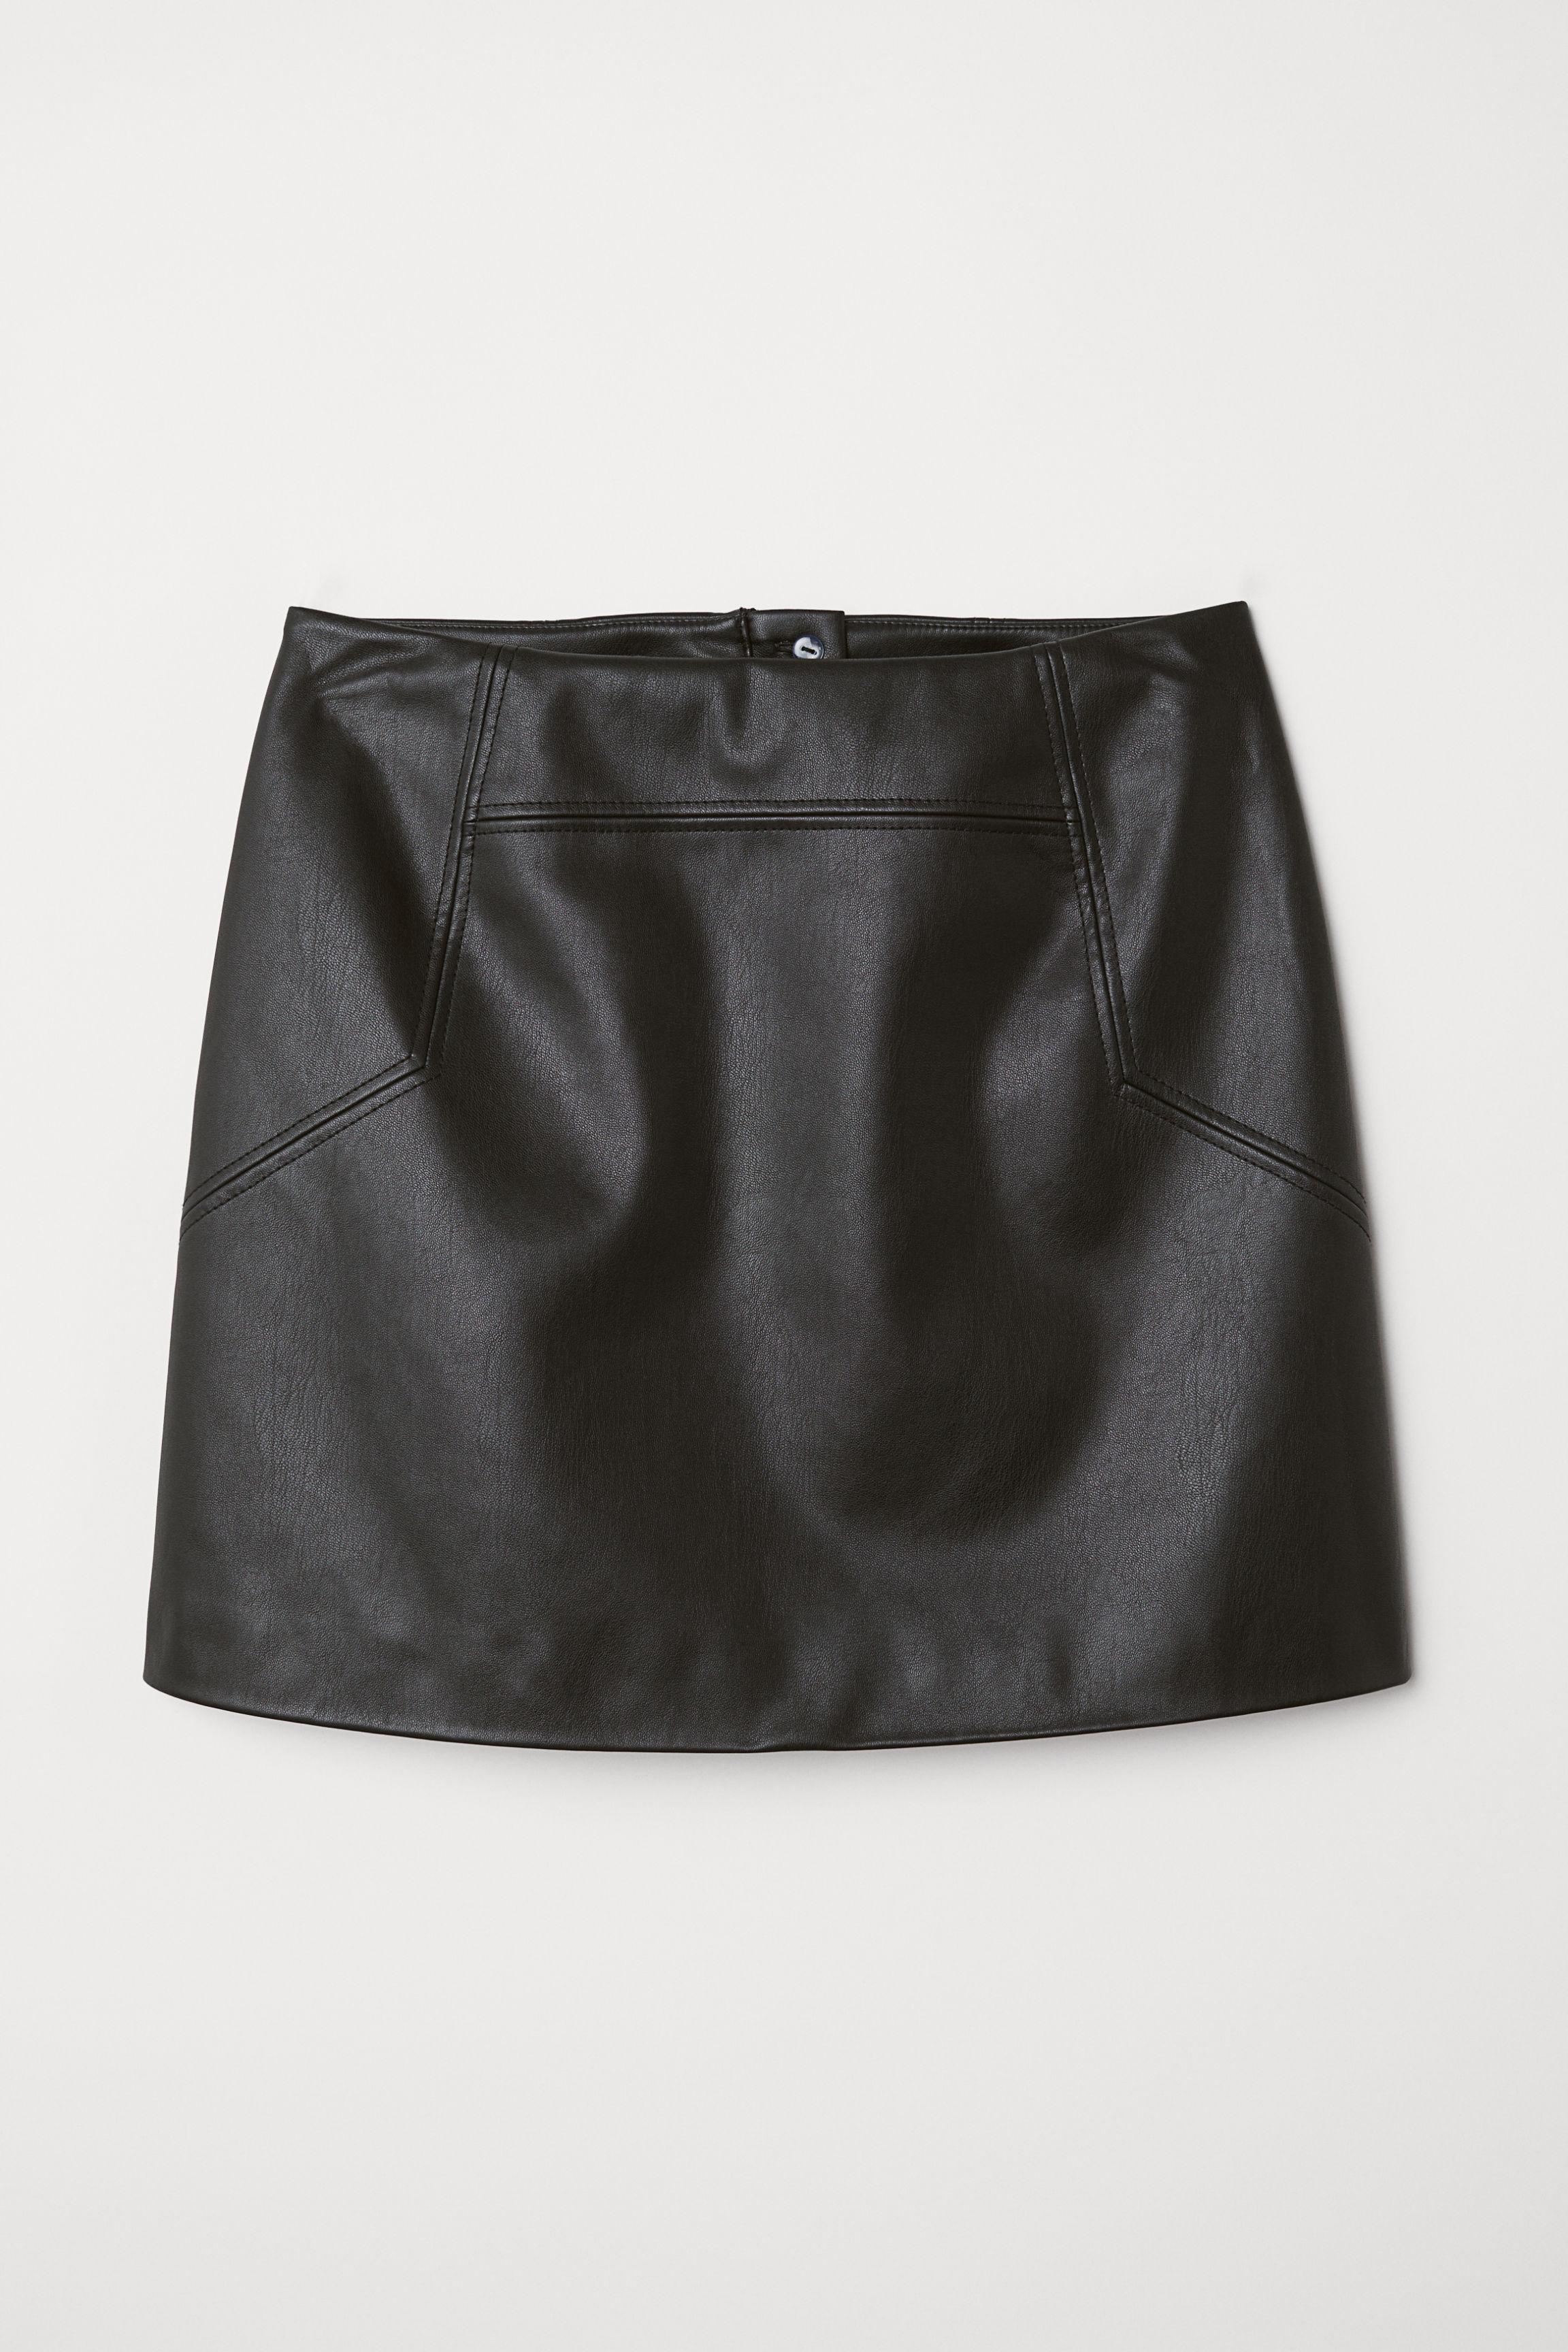 2b21e55a42d2 Brown Faux Leather Wrap Skirt